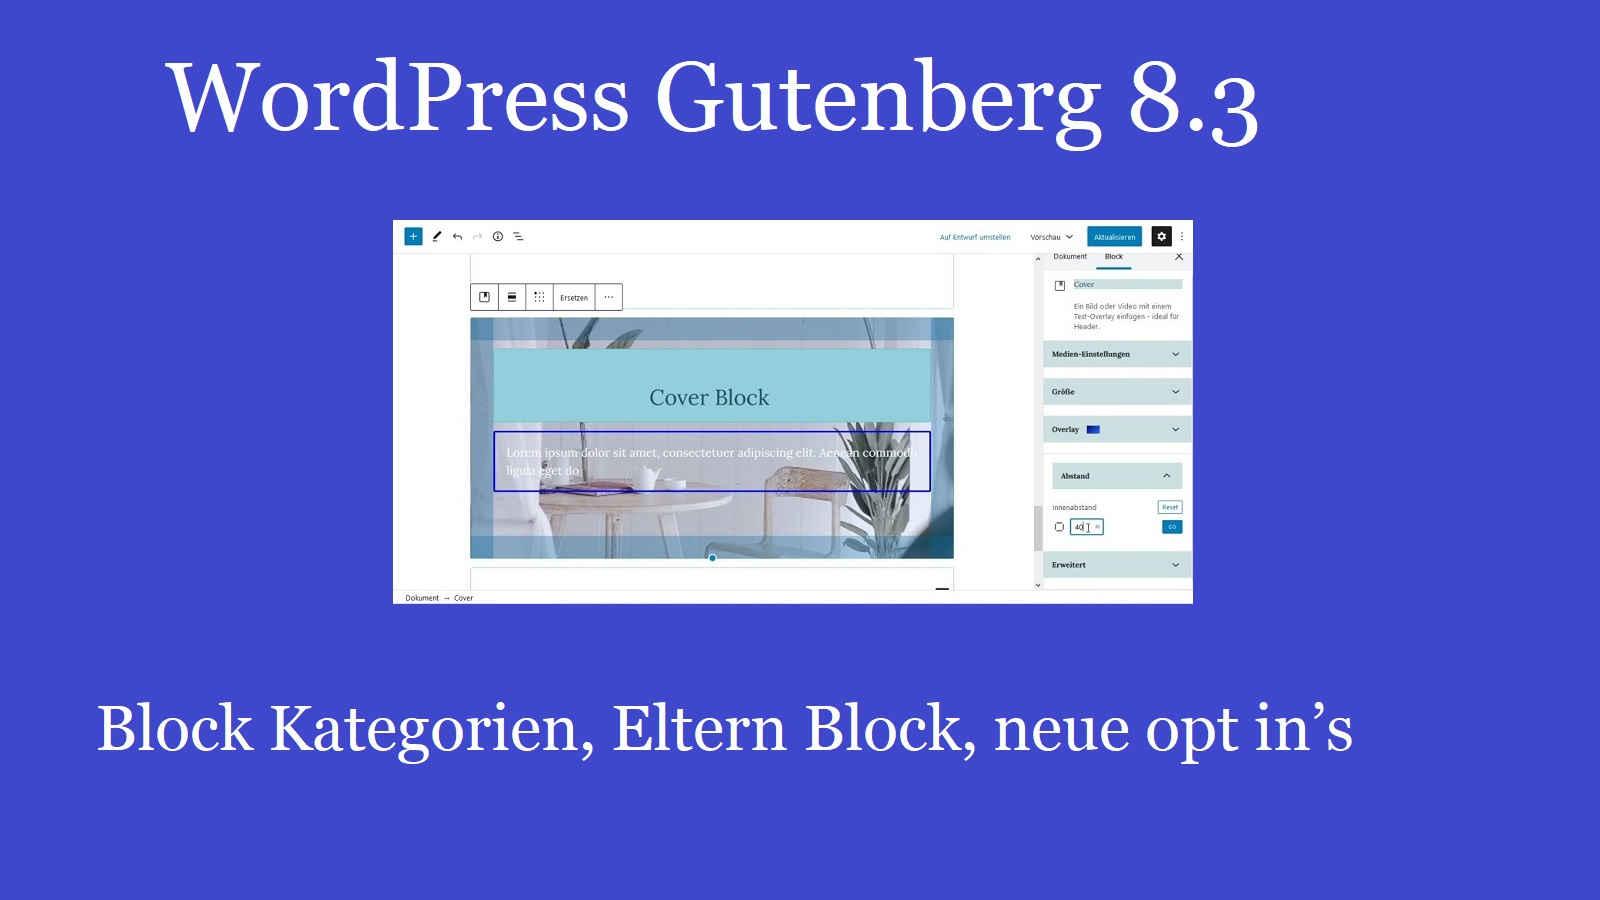 wp-gutenberg-8.3